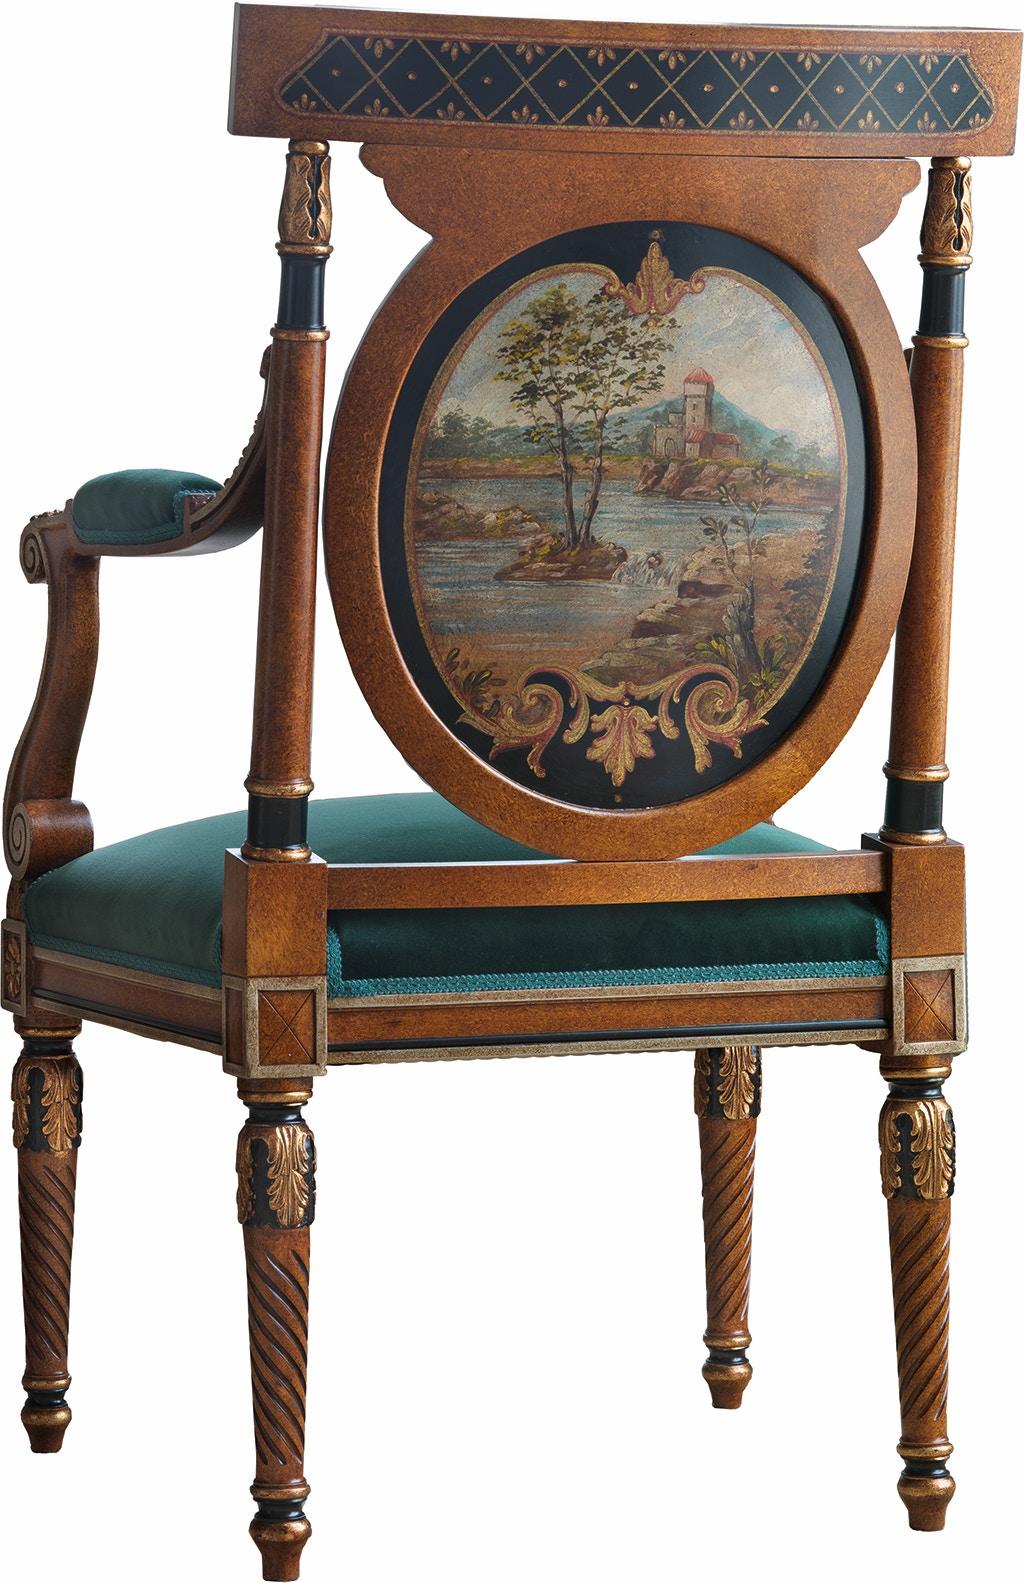 Von Hemert Interiors Italian Imports Mfr: XI29 Arm Chair #1503 P